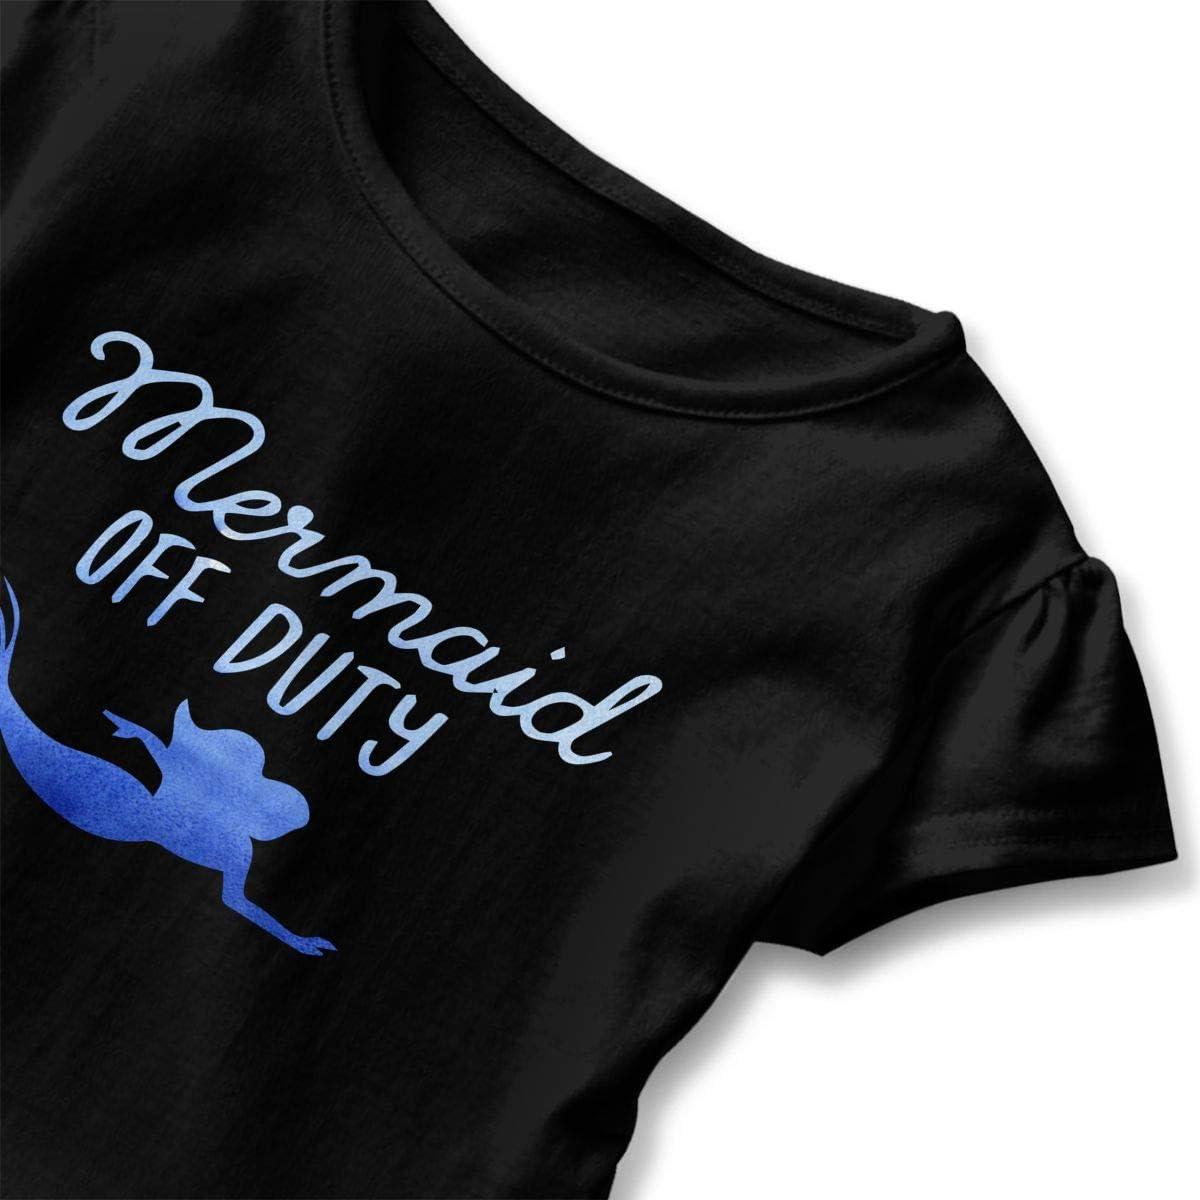 Mermaid Off Duty Toddler Girls T Shirt Kids Cotton Short Sleeve Ruffle Tee